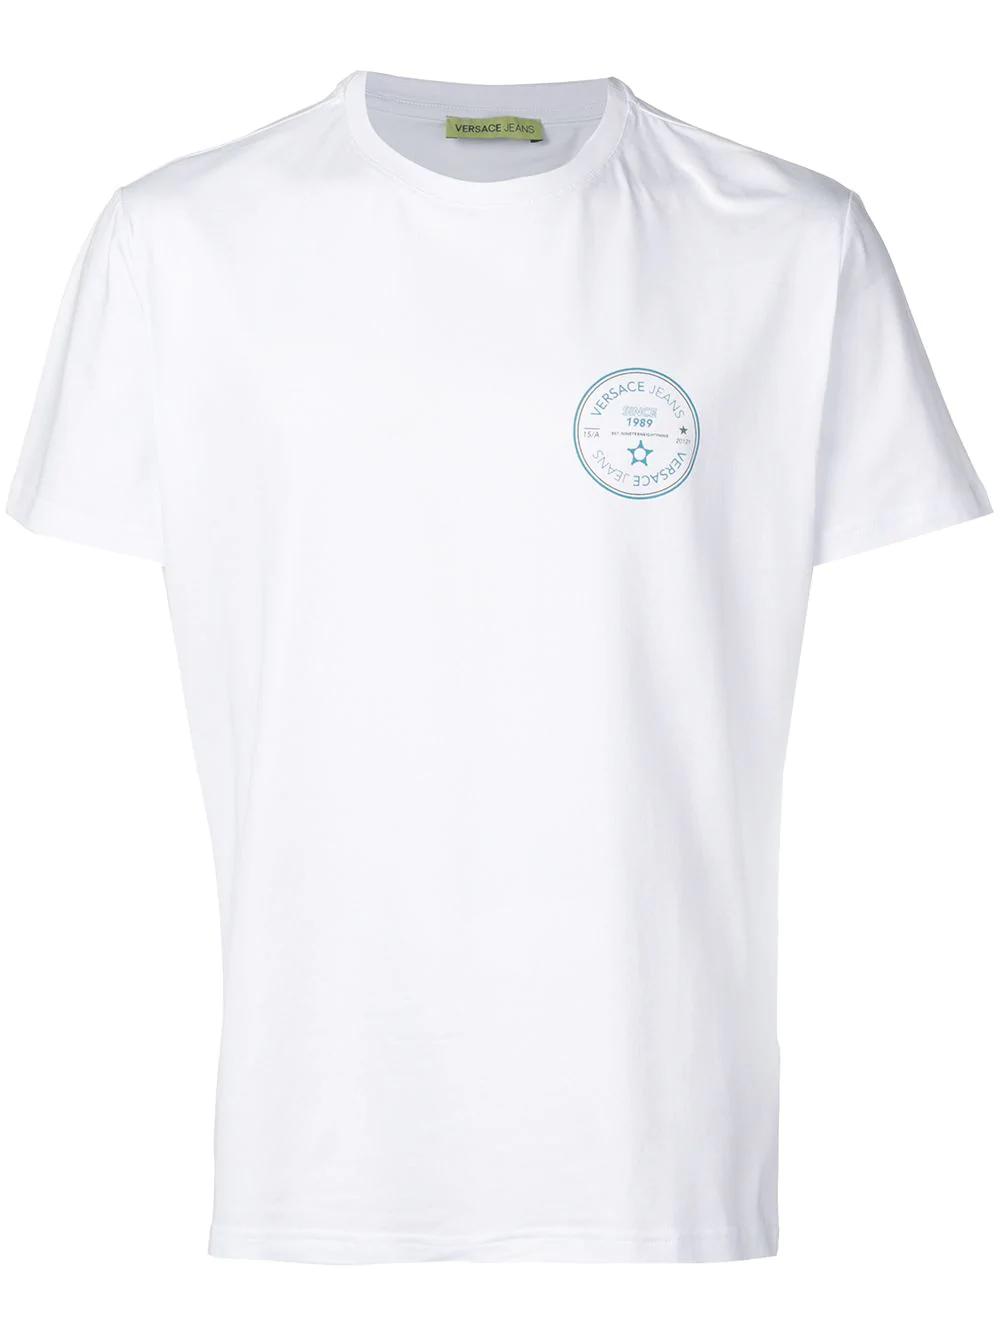 19eb493a Versace Jeans White Shirt - raveitsafe